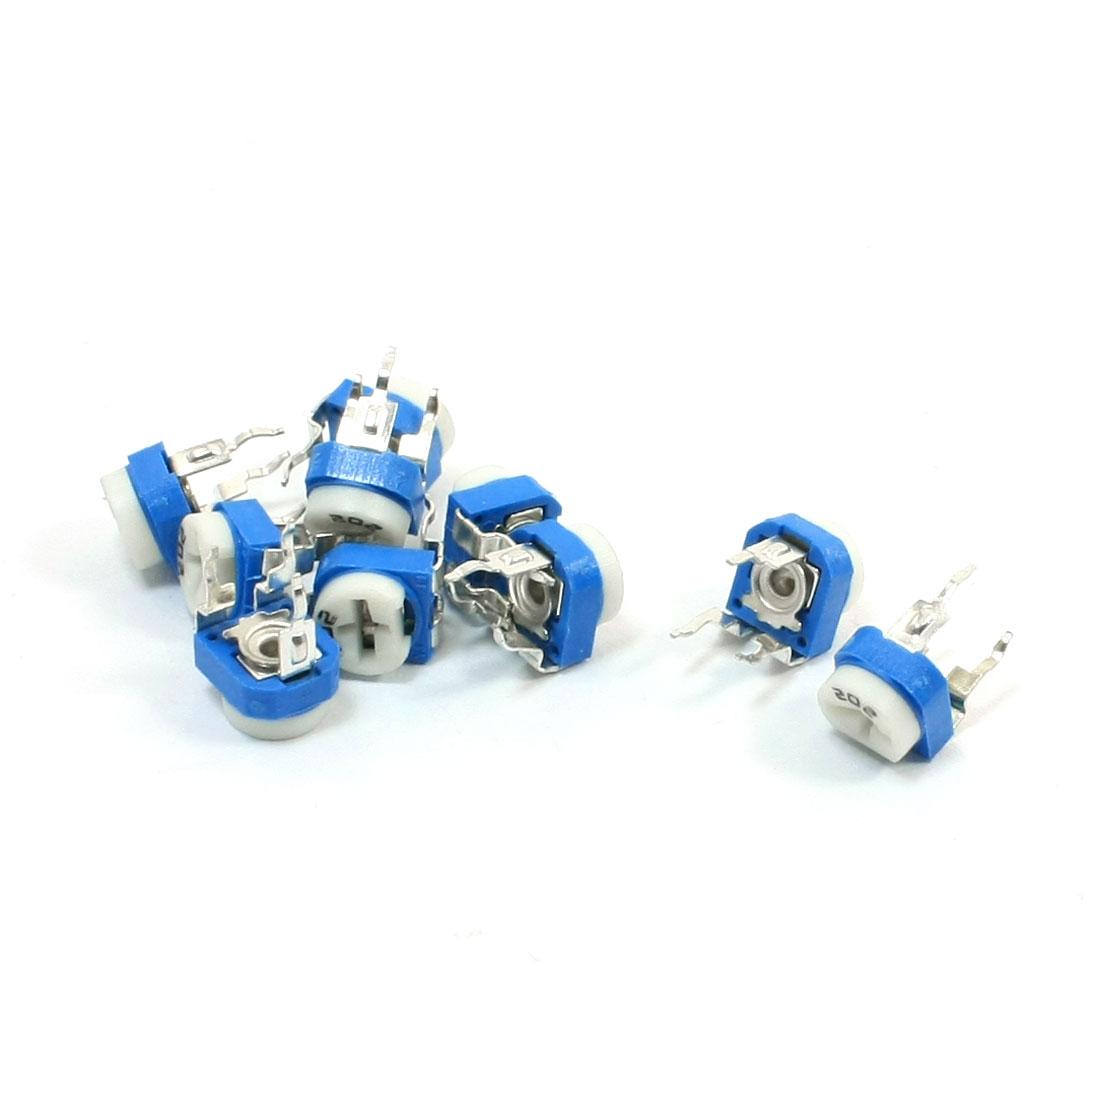 10Pcs DIP Cermet Trimmer Potentiometer Variable Resistor 2K Ohm WH06-2